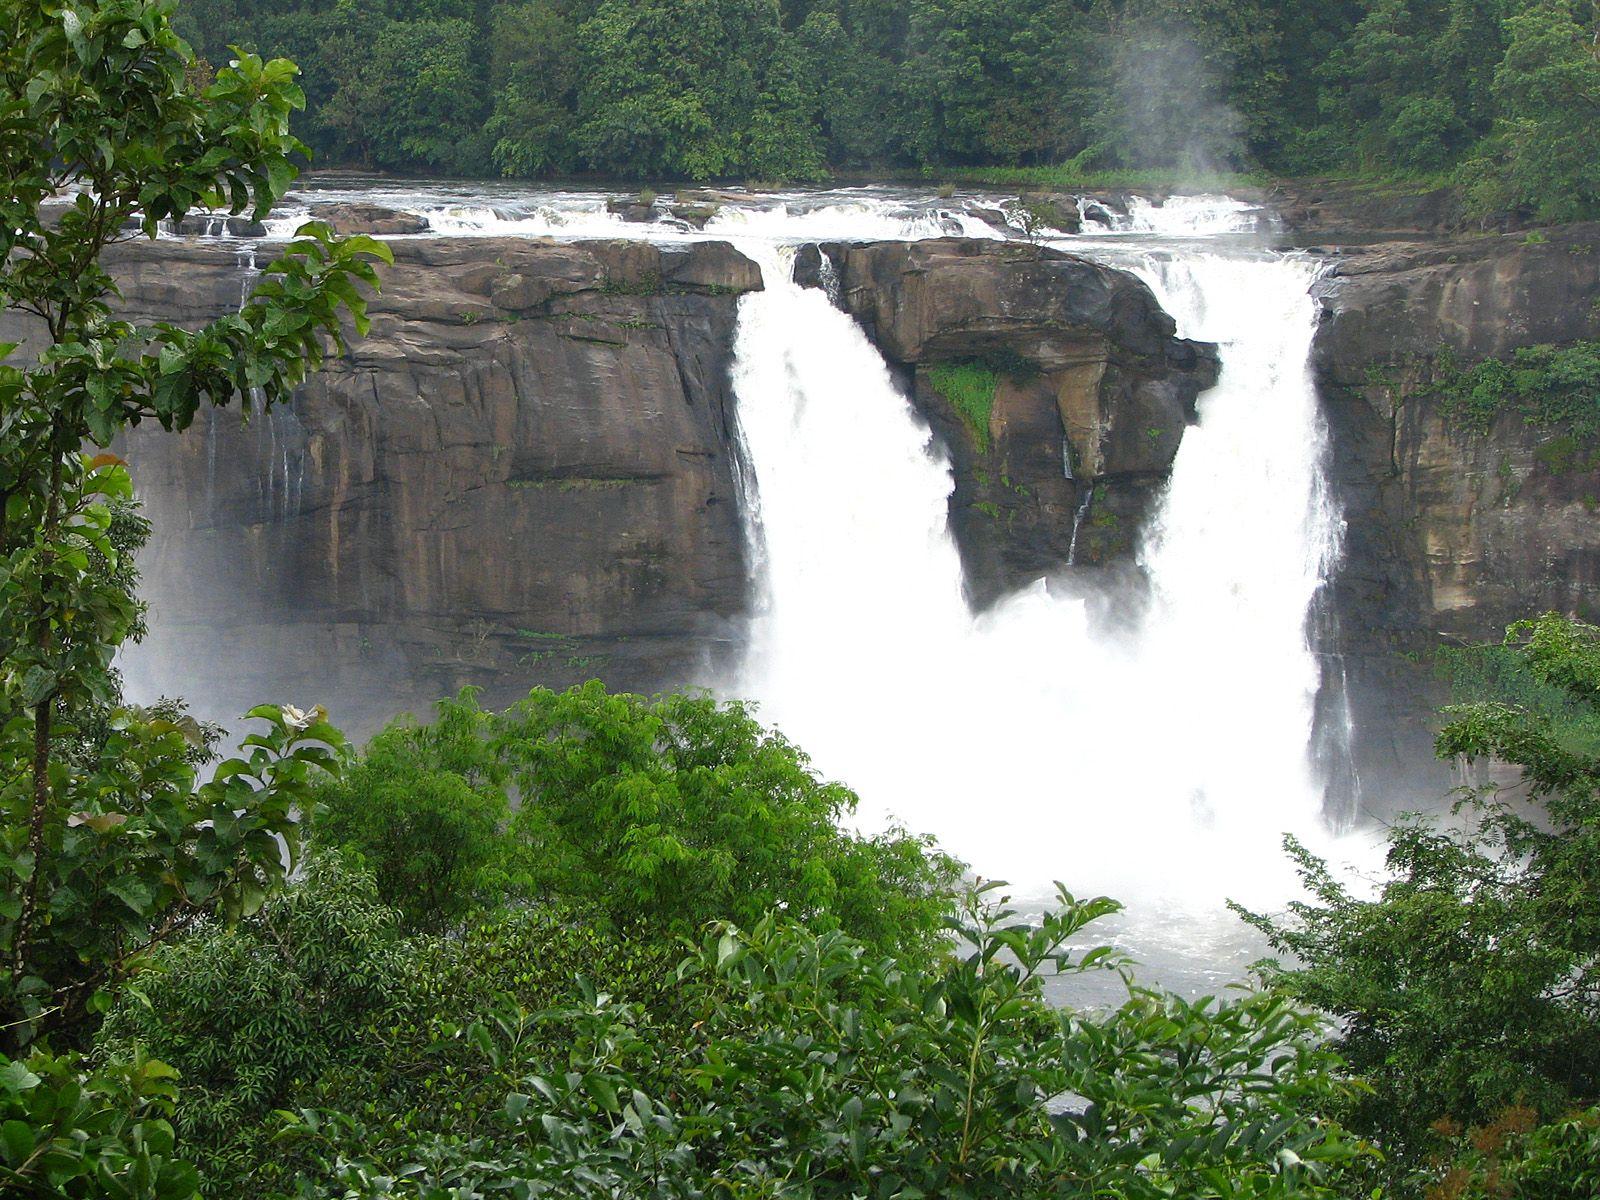 Водопад Атираппилли издали